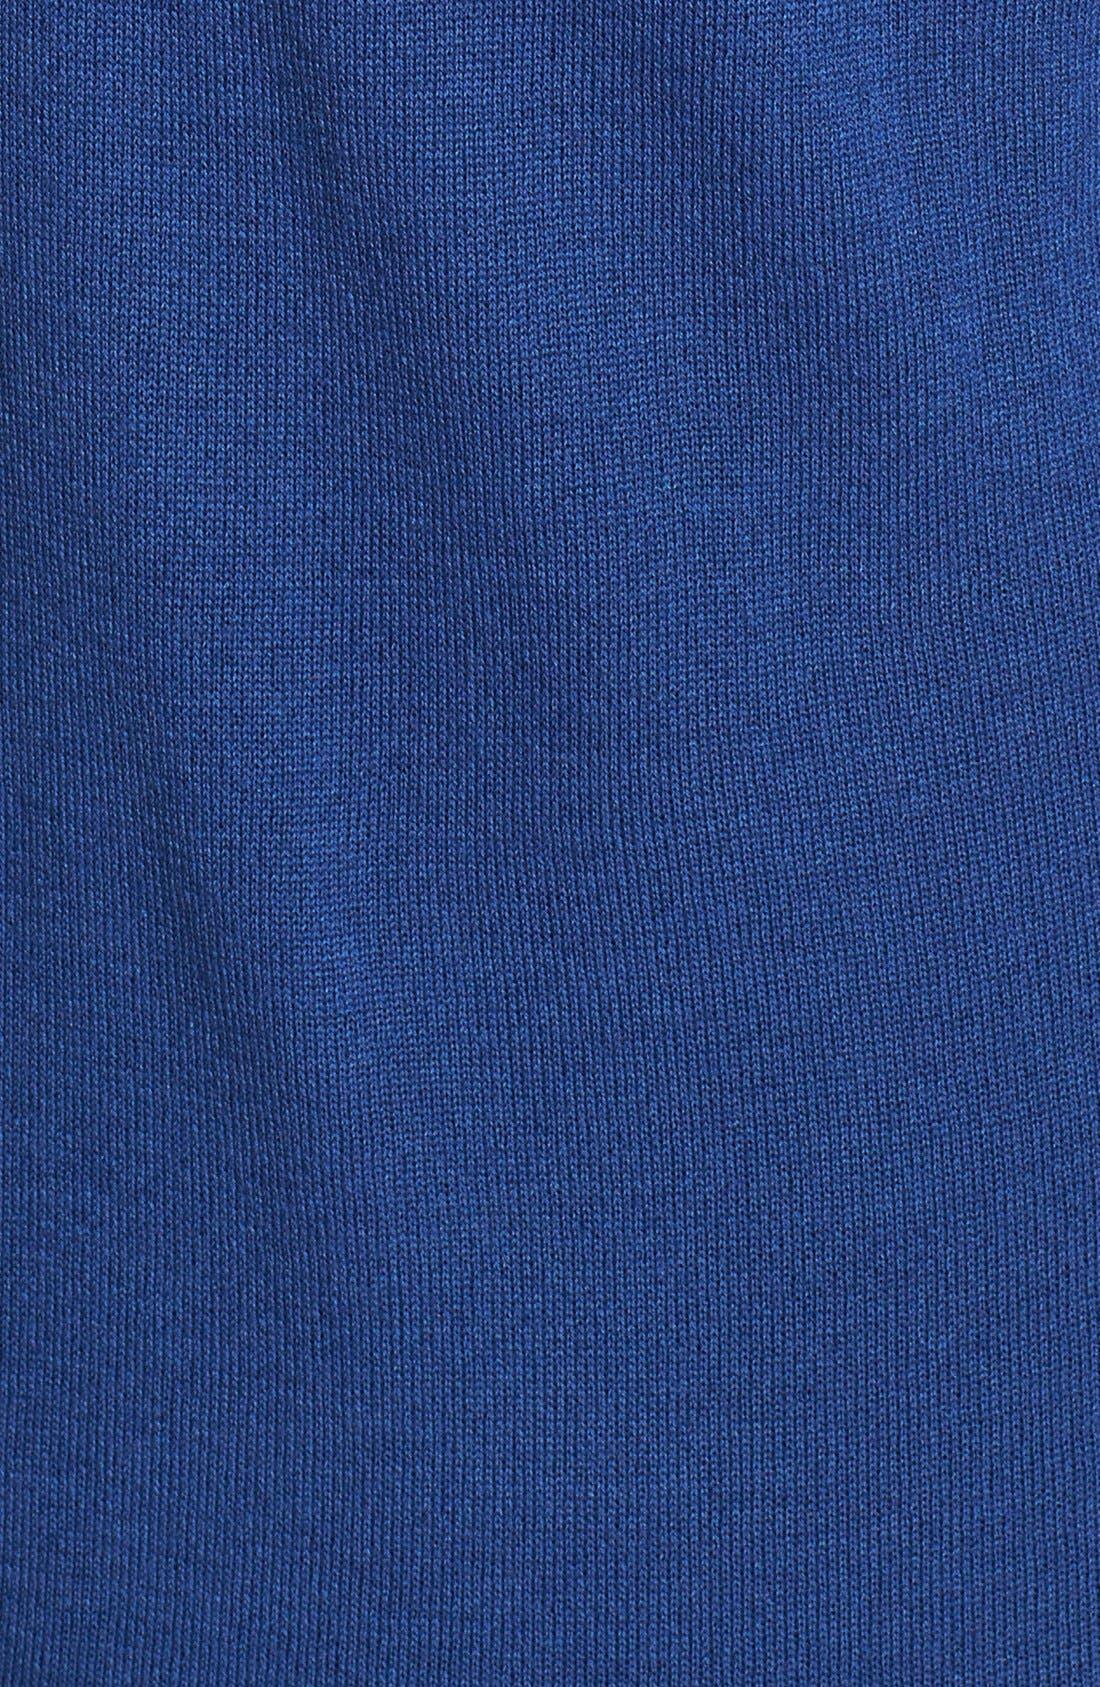 Alternate Image 4  - Sejour Faux Leather Collar Sweater (Plus Size)